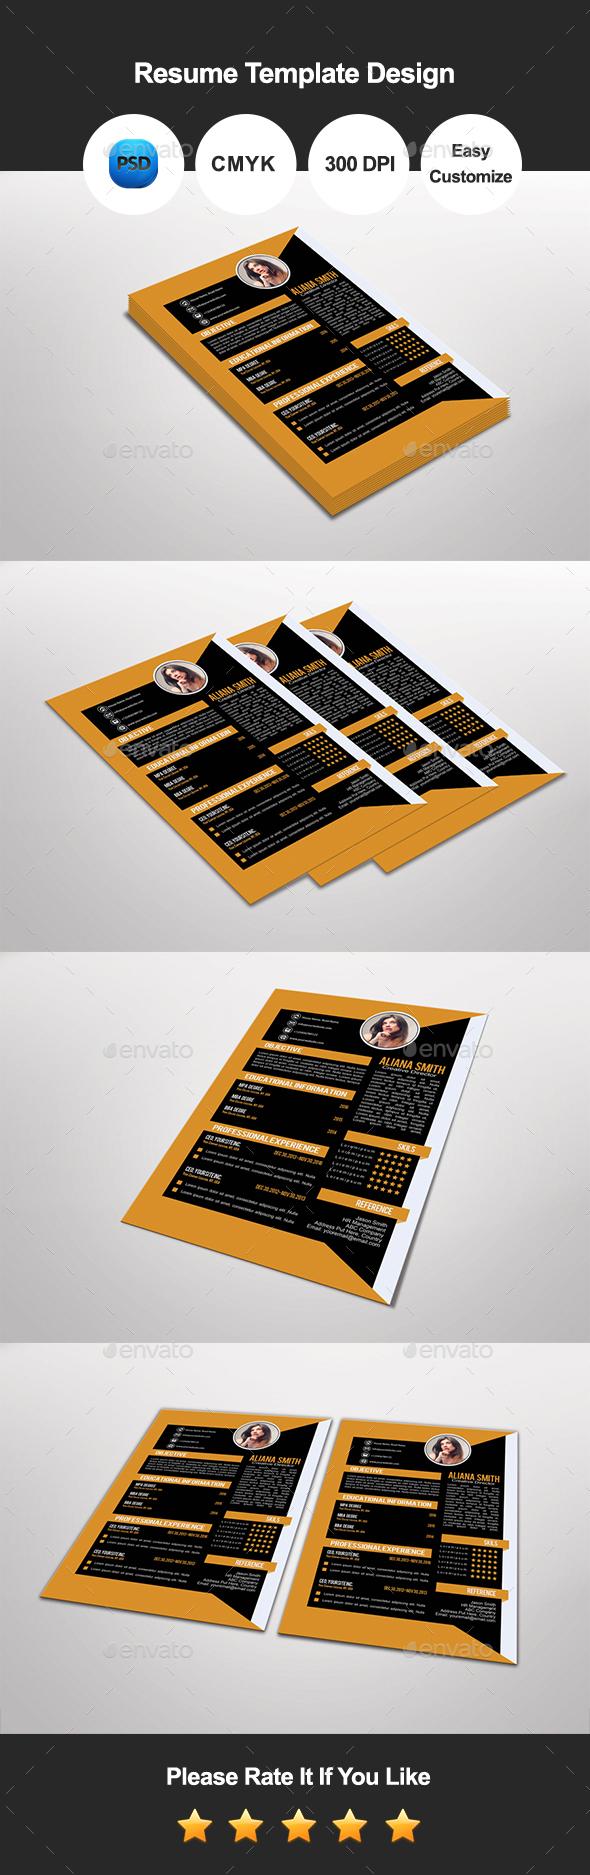 Teanli Resume Template Design